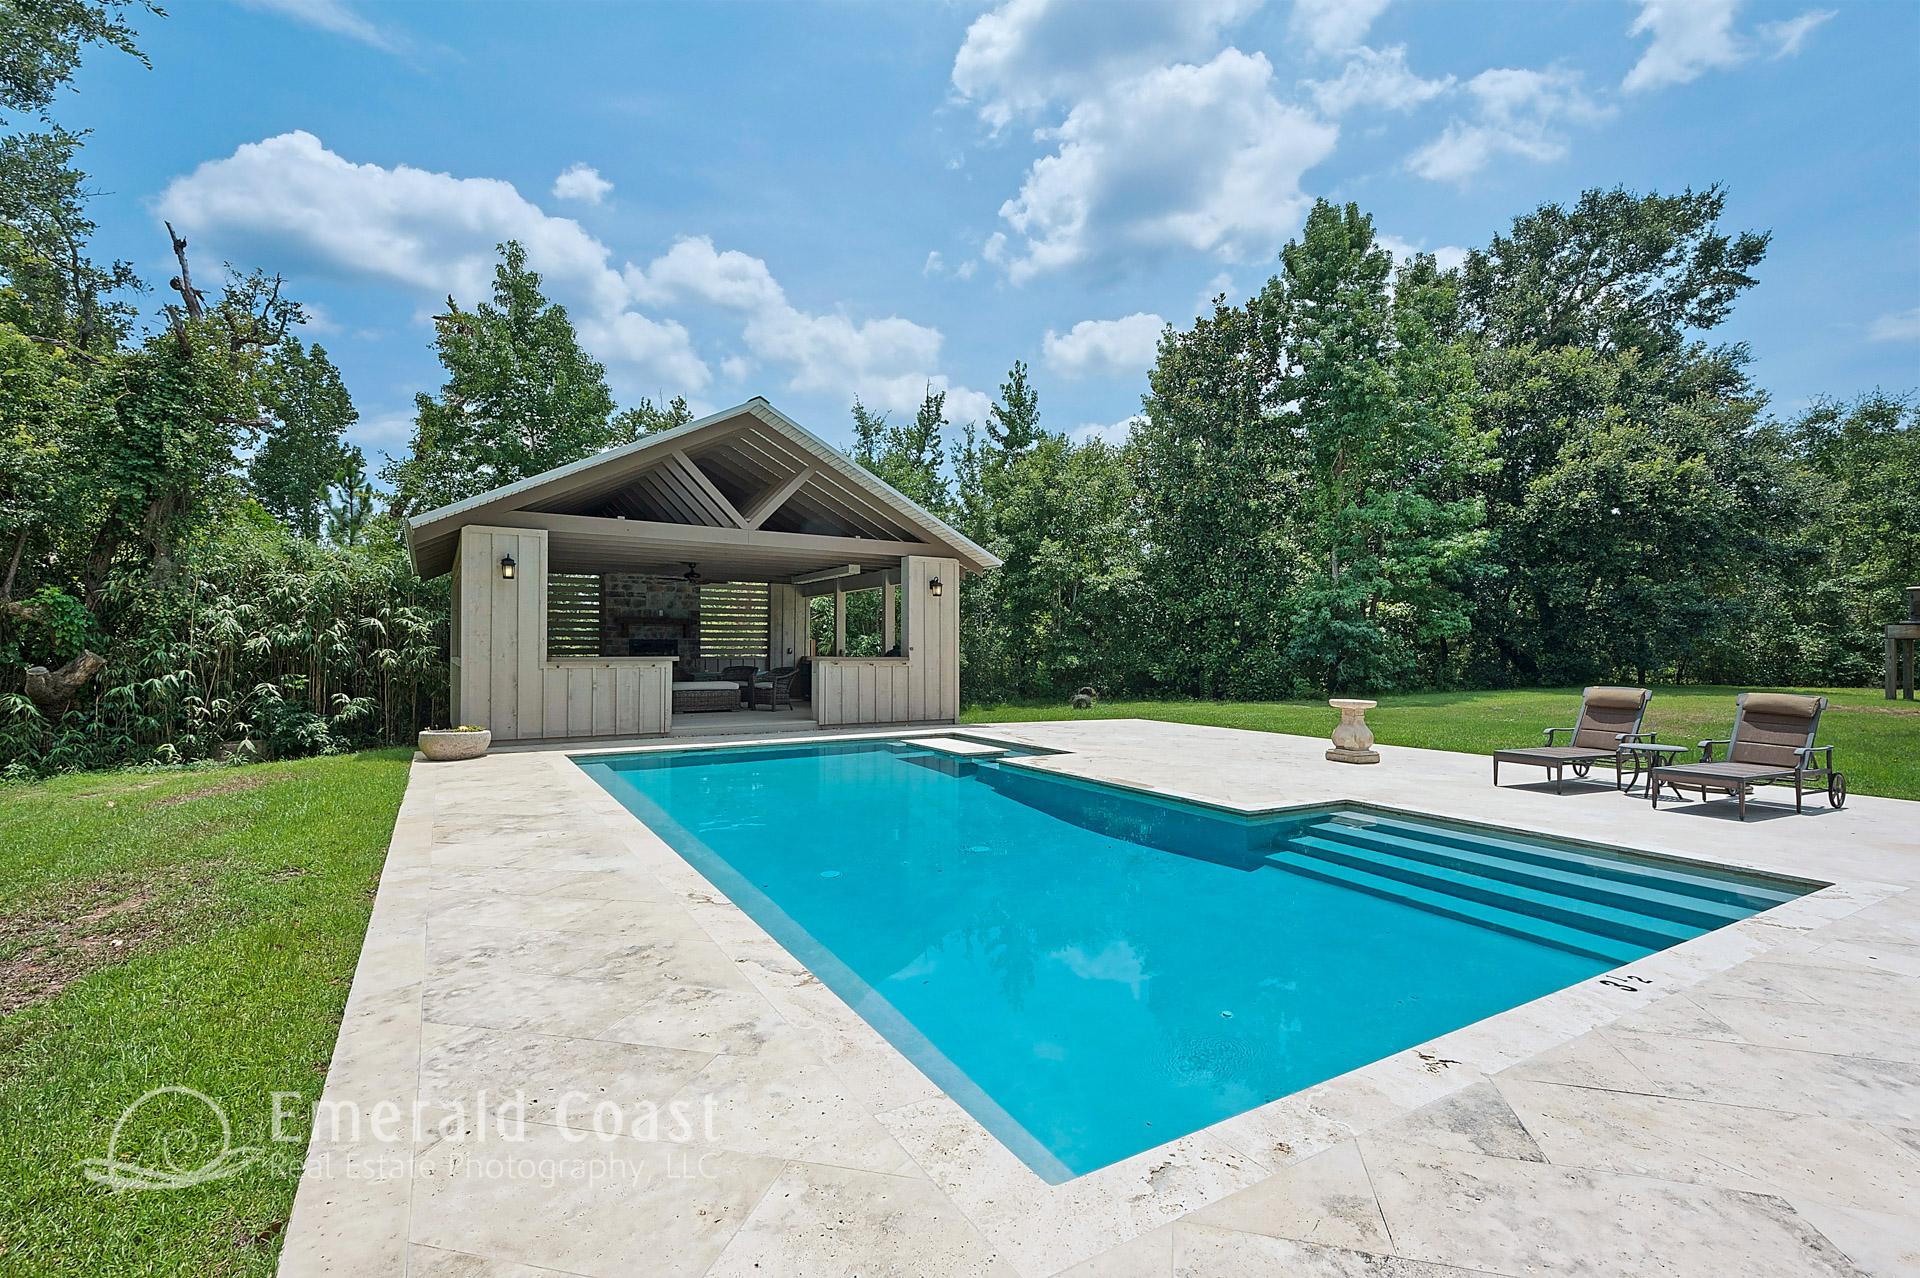 swimming pool with bath ho0use